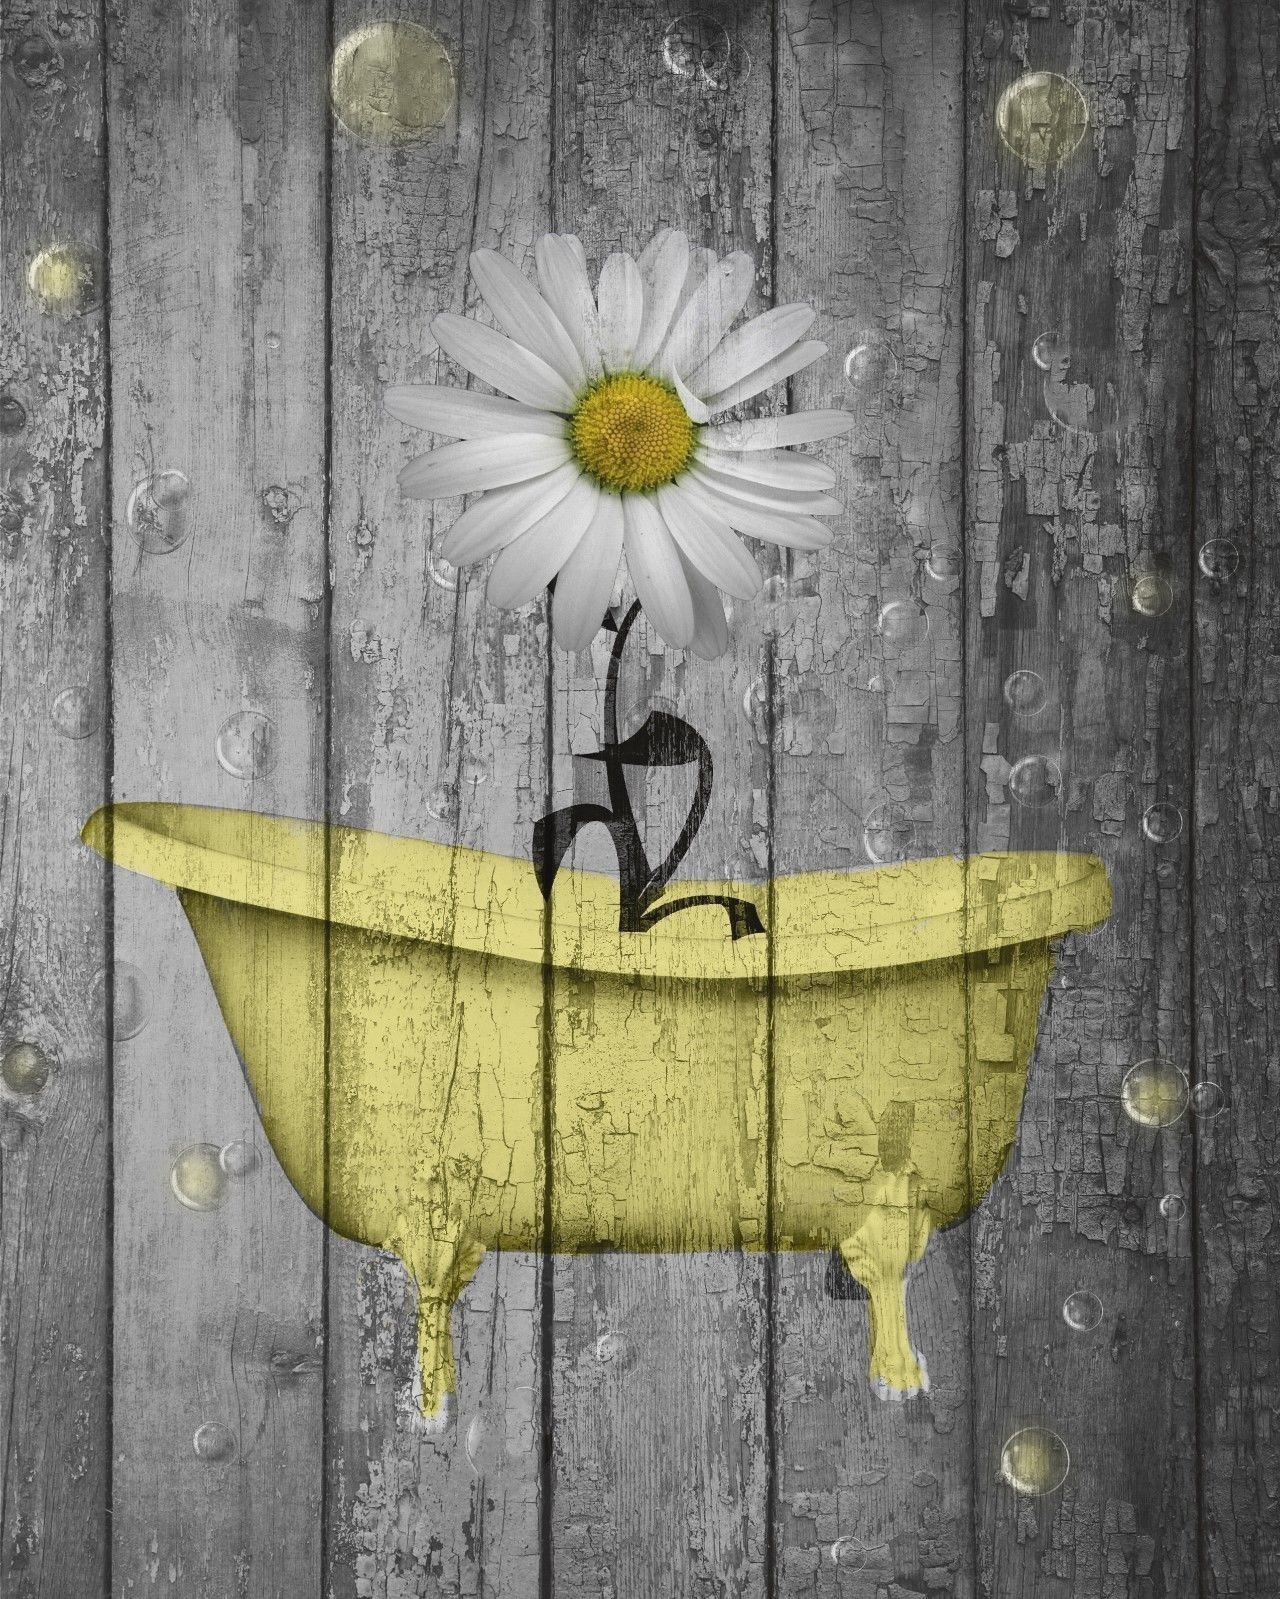 Daisy Kitchen Decor: Rustic Yellow Daisy Flowers Bathtub Vintage Bathroom